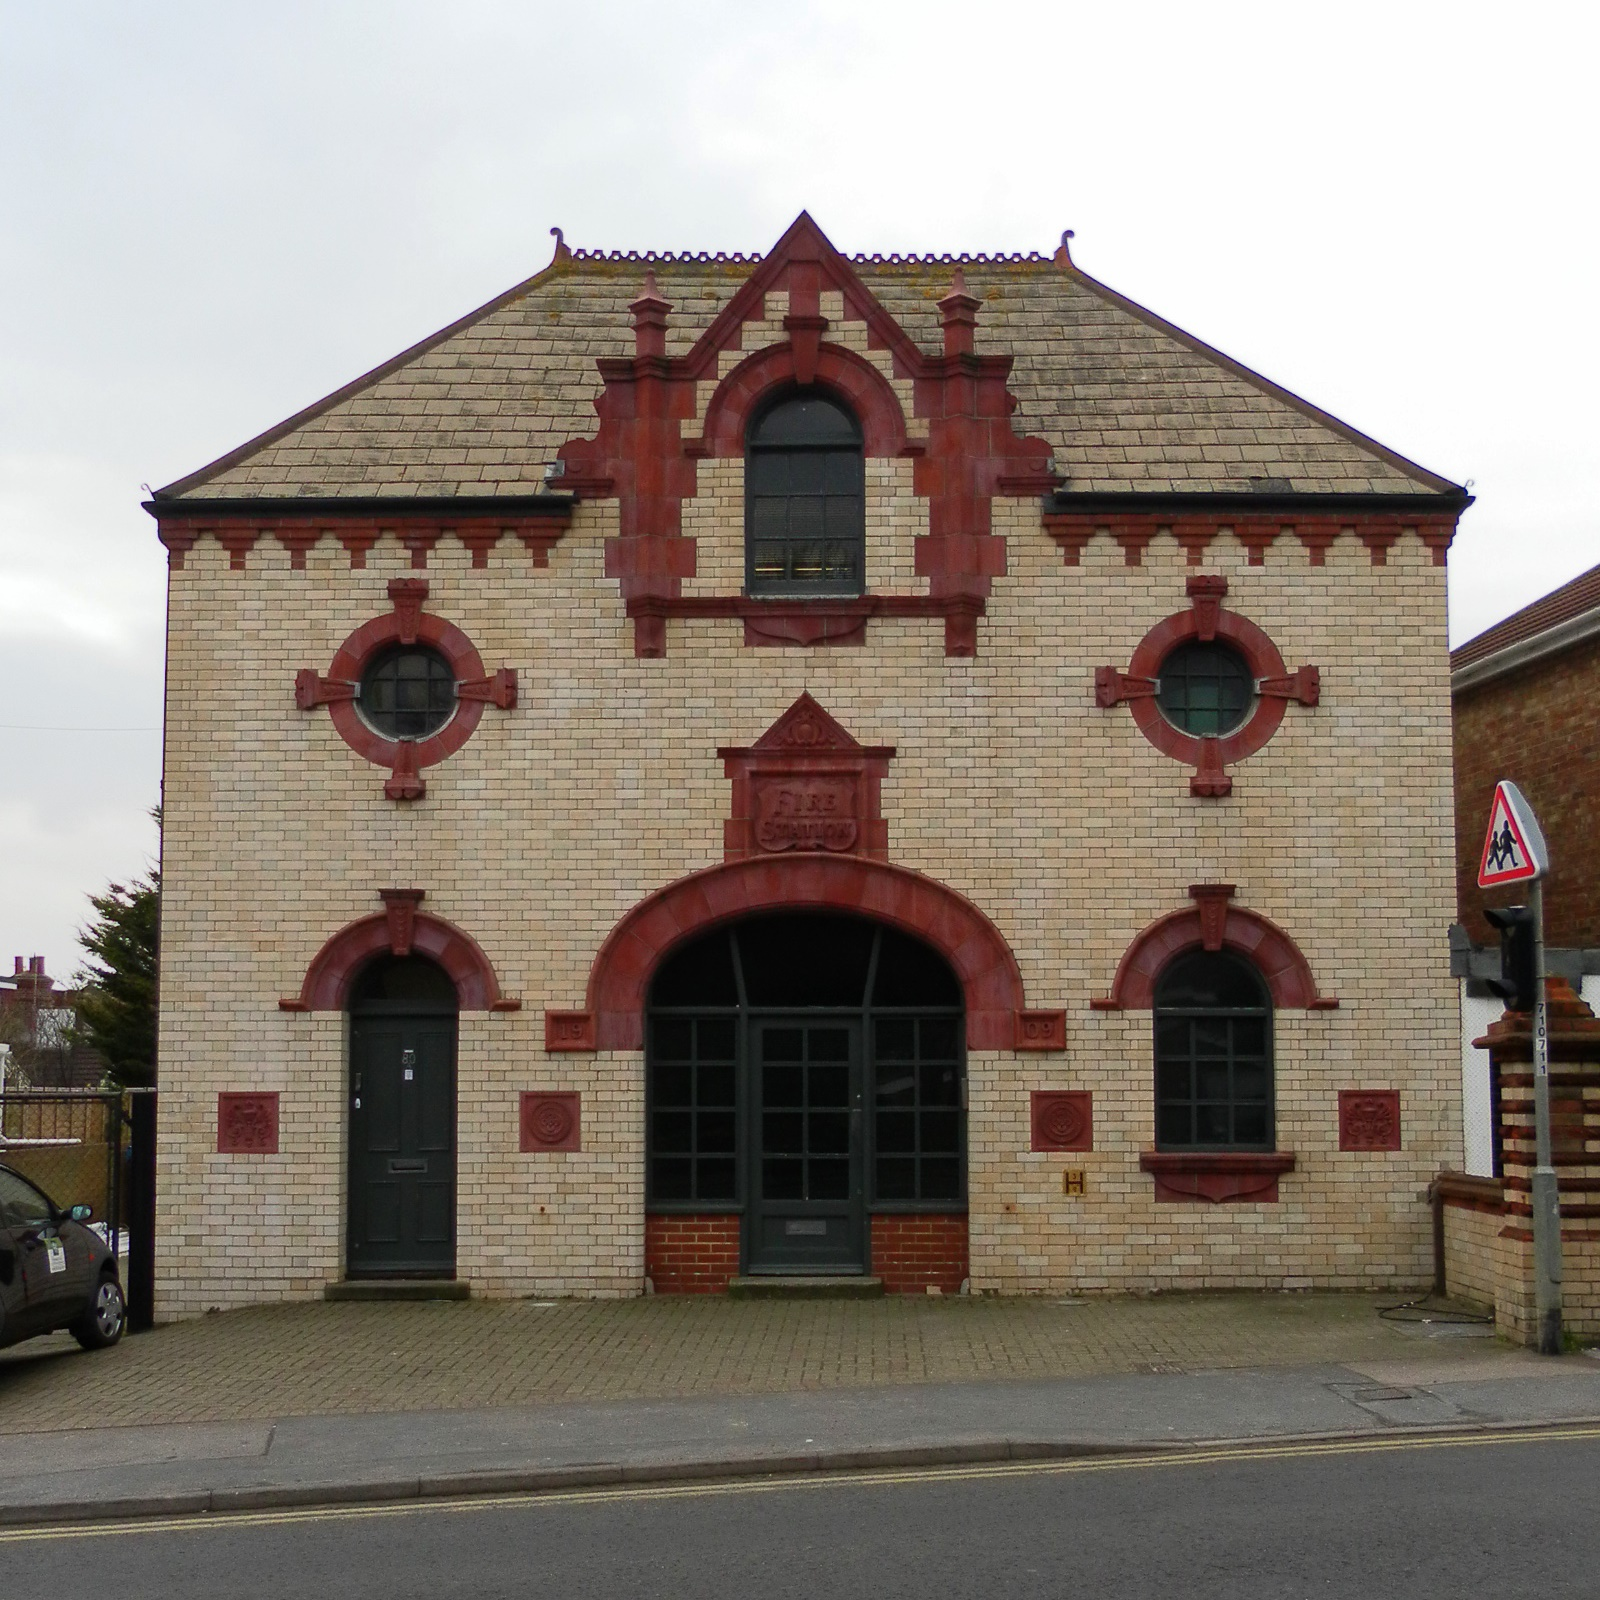 Old Building In Portslade